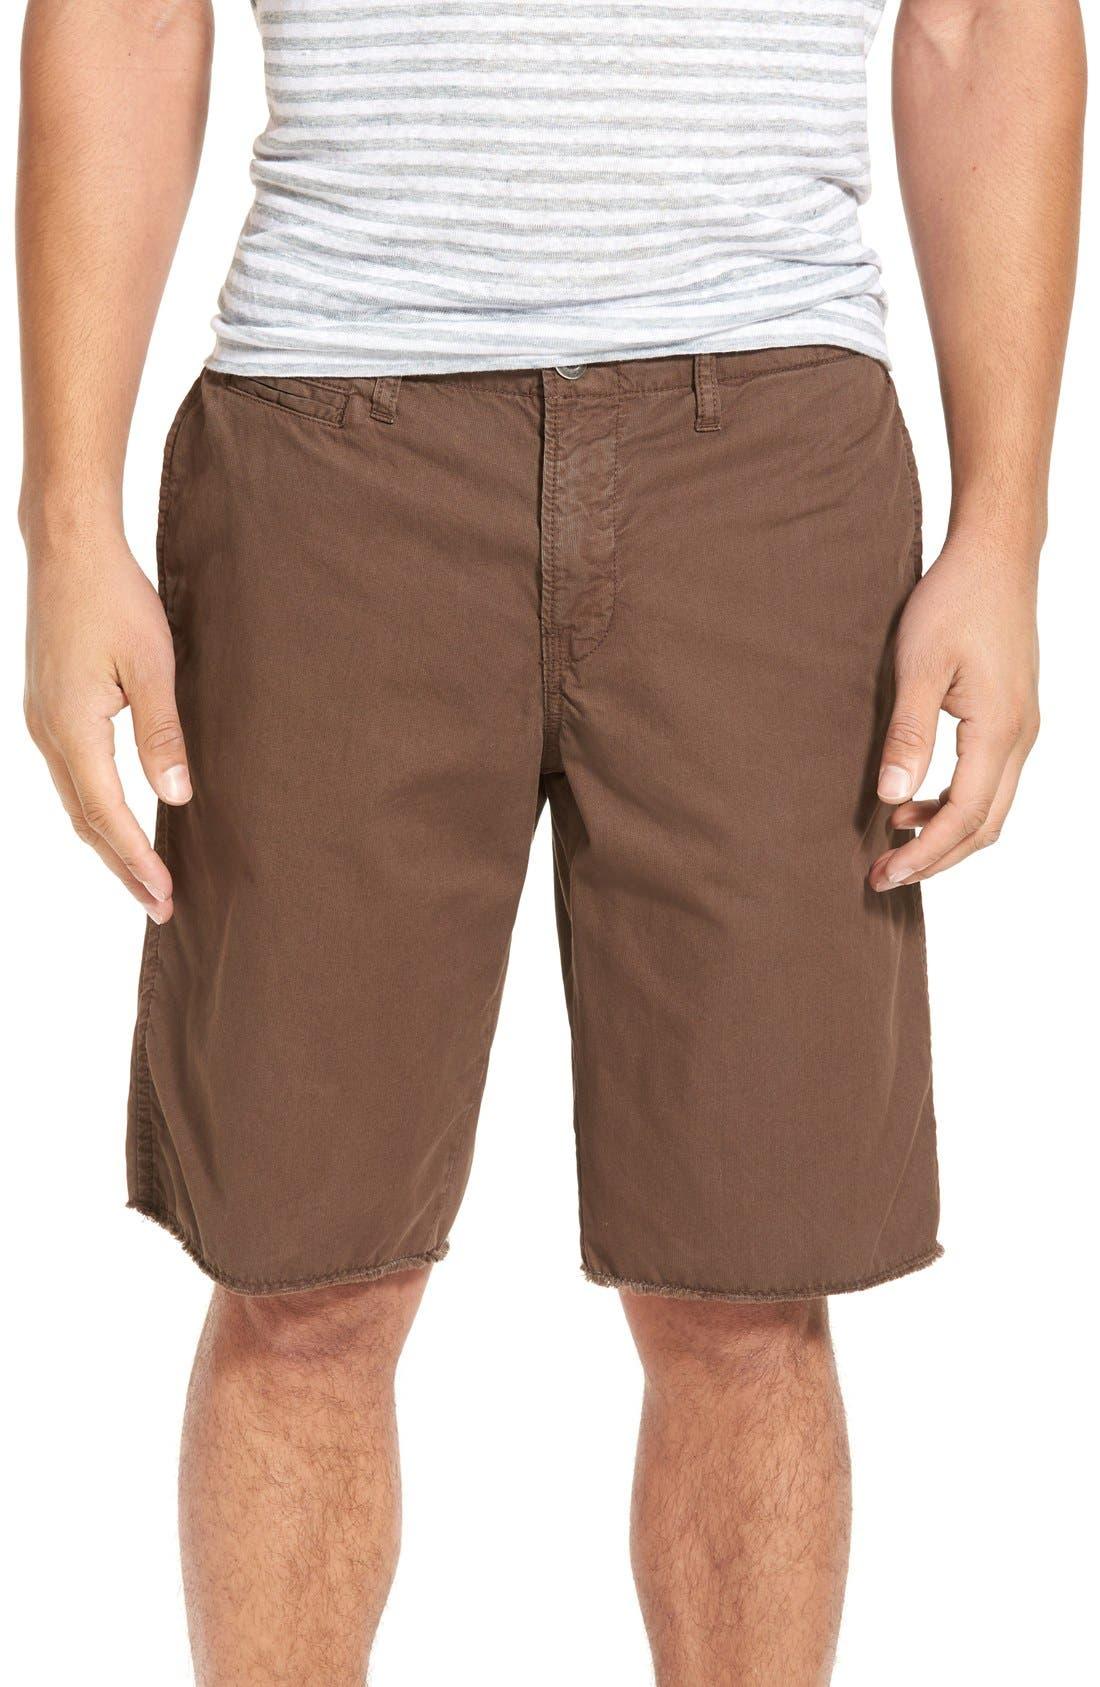 Original Paperbacks 'St. Barts' Raw Edge Shorts